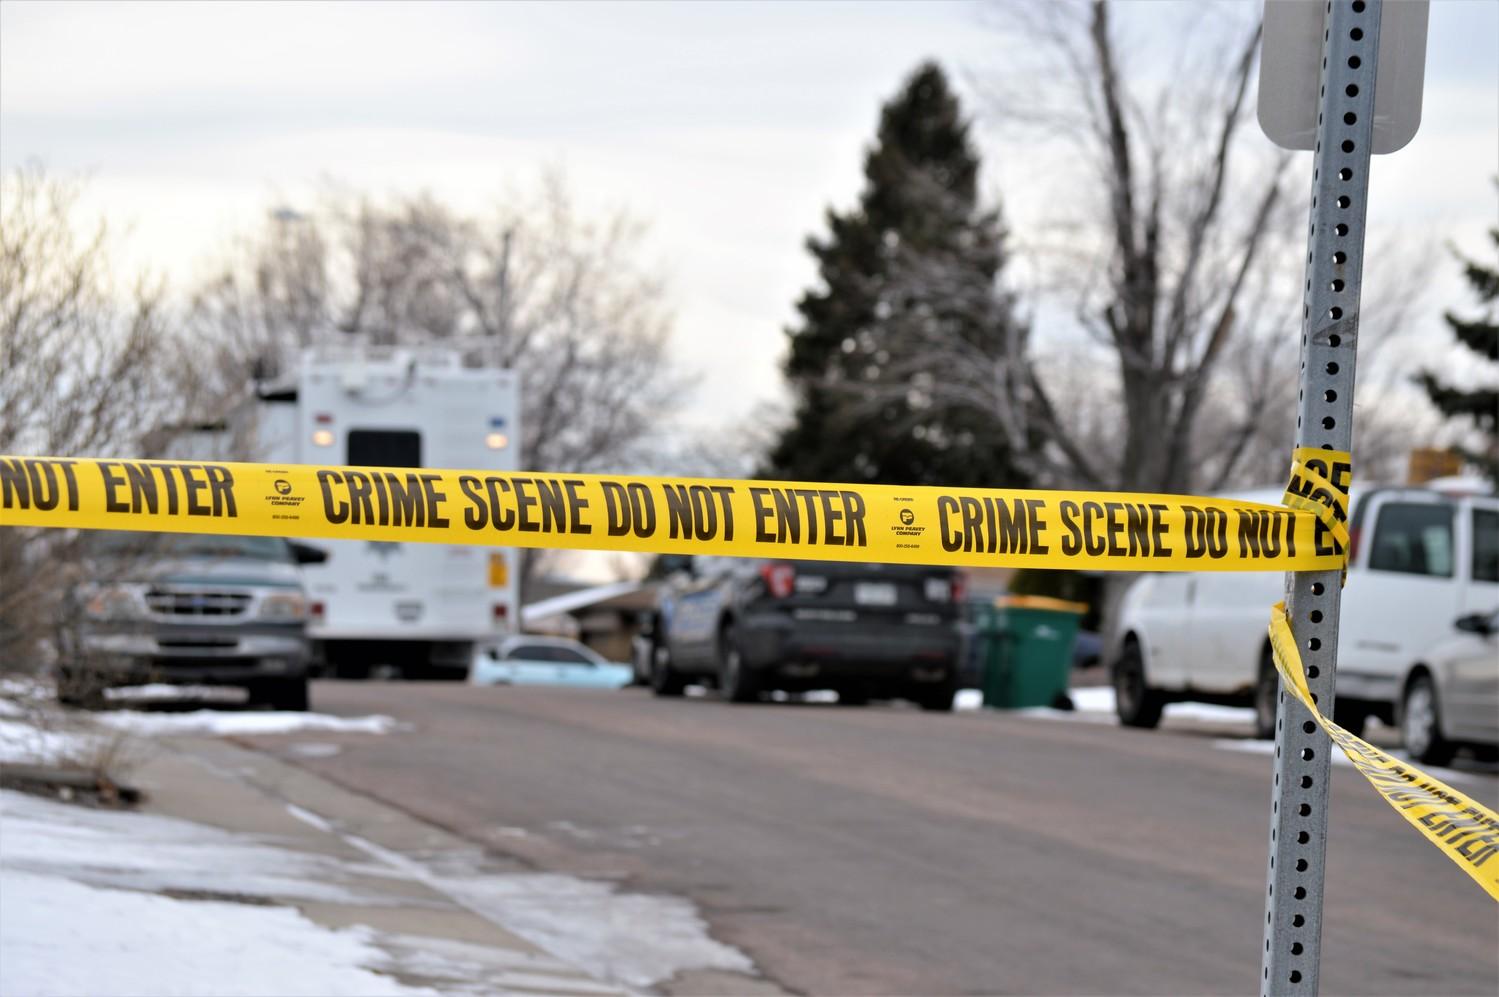 Deputy shot near Thornton; suspect at large